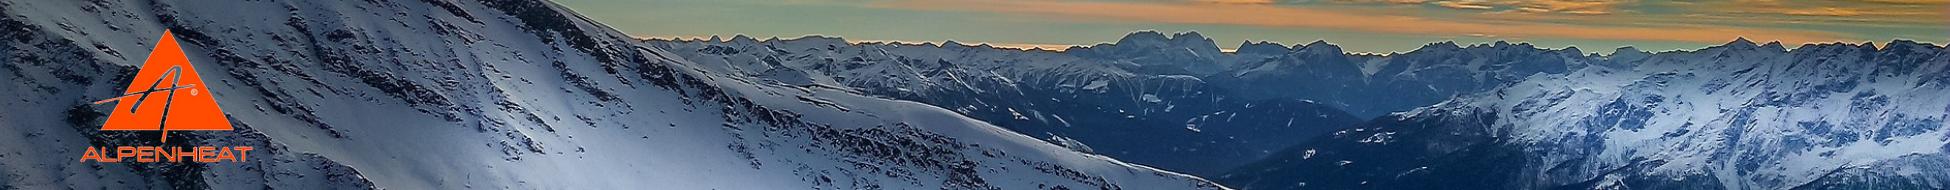 Alpenheat Header